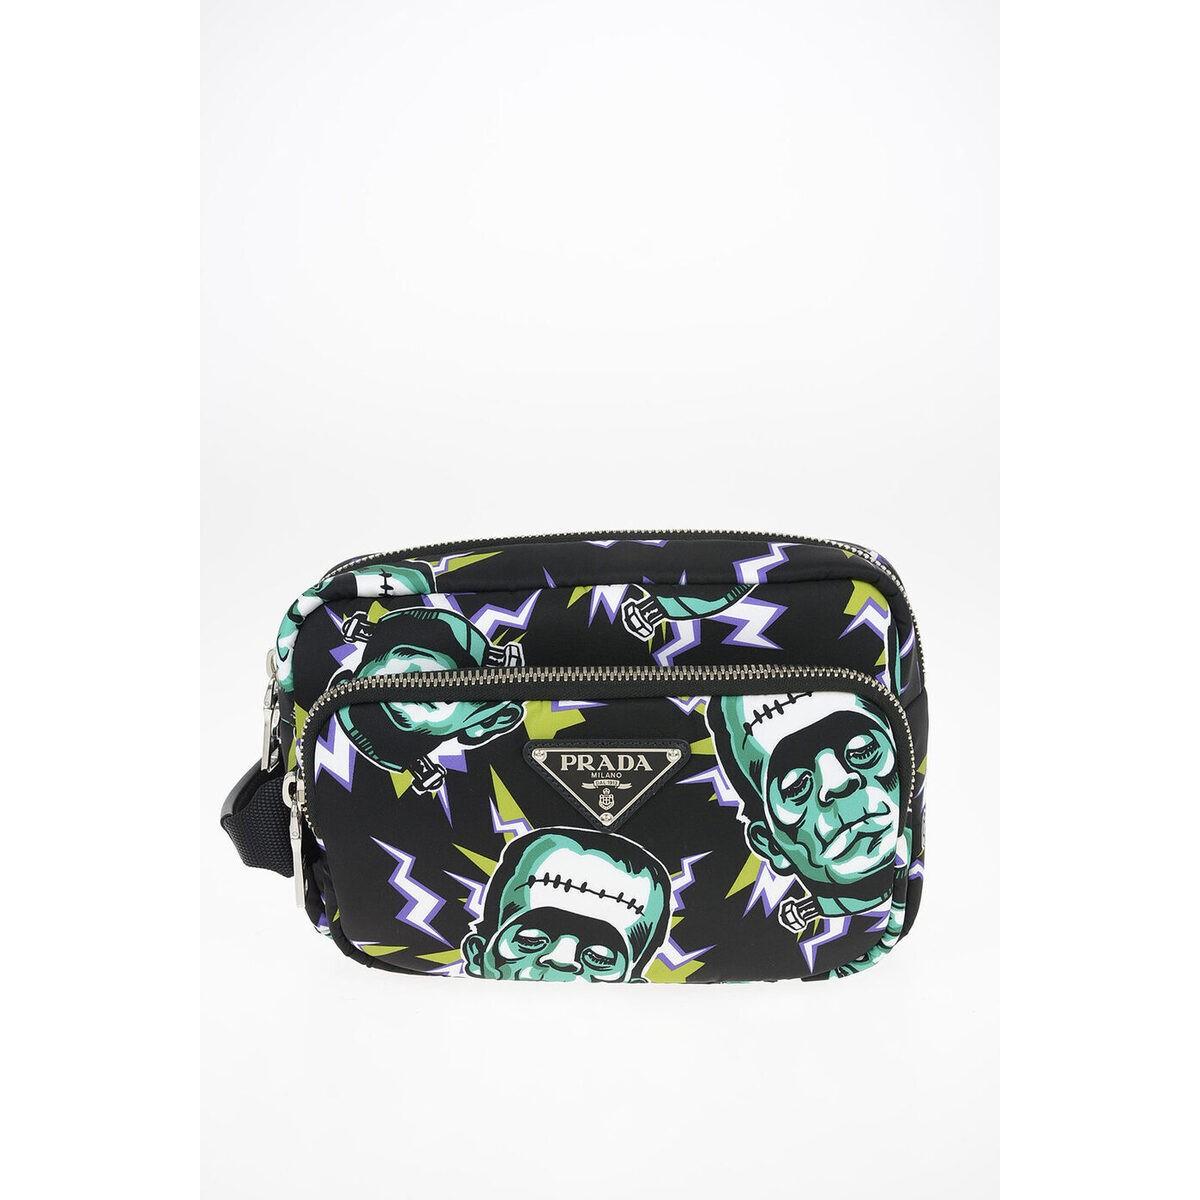 PRADA/プラダ Black メンズ FRANKENSTEIN Printed Fabric Bag with Removable Shoulder Stra dk